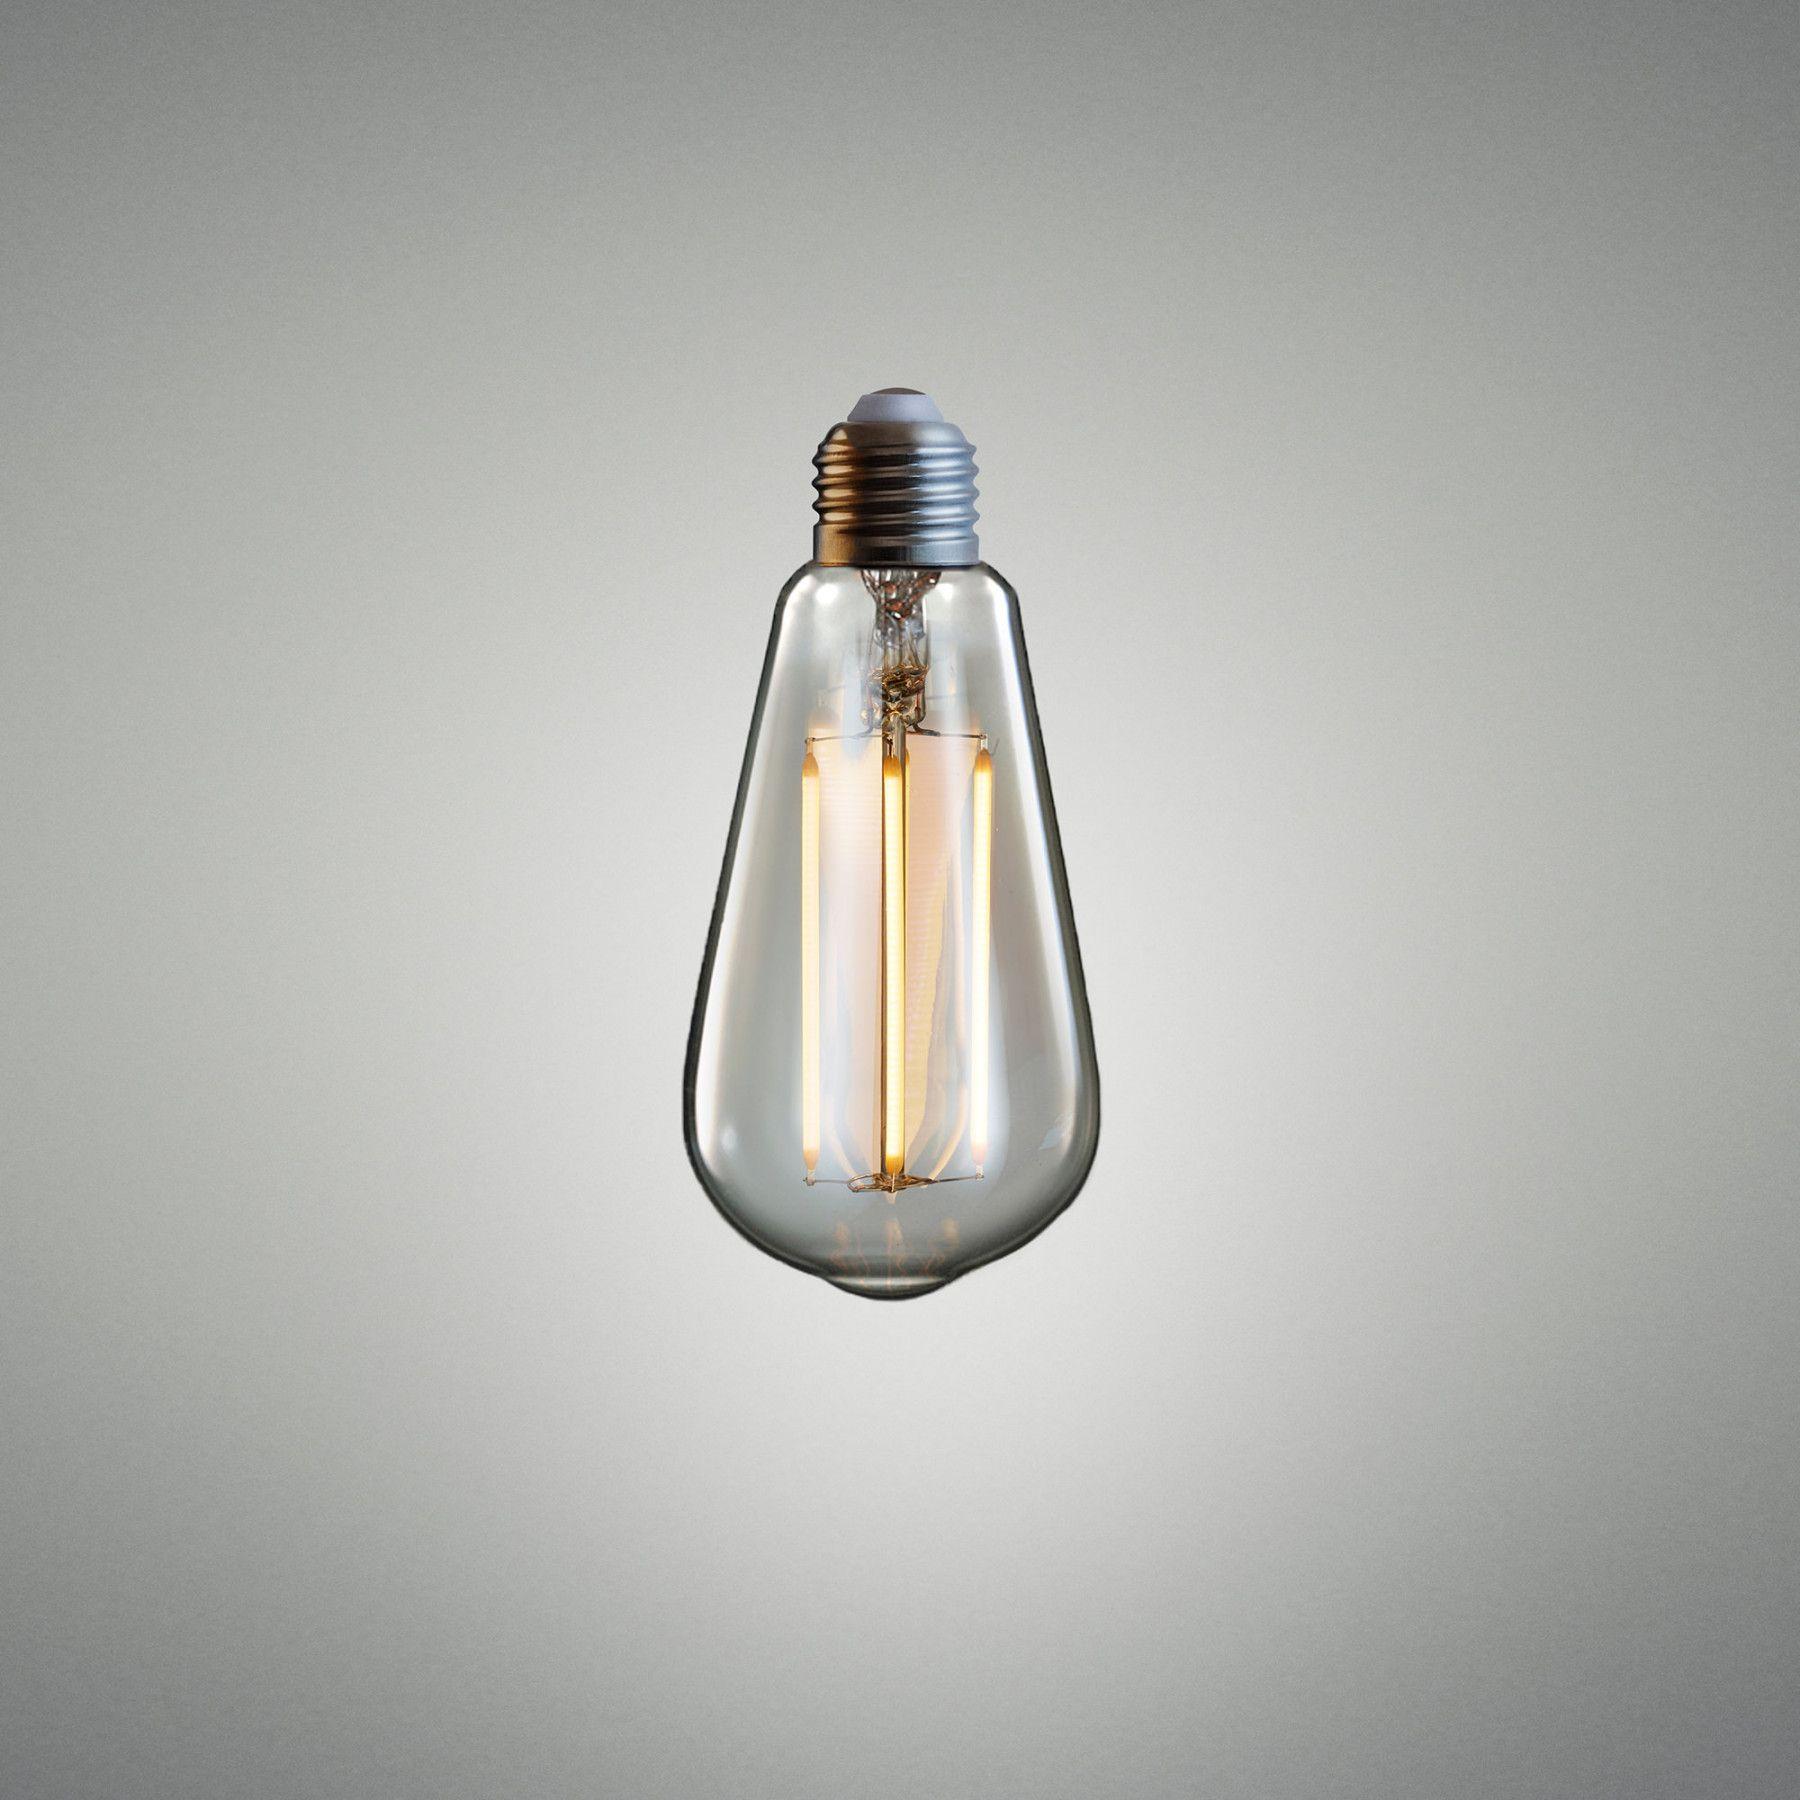 LED TEARDROP / AMBER Bulb, Led bulb, Contemporary light